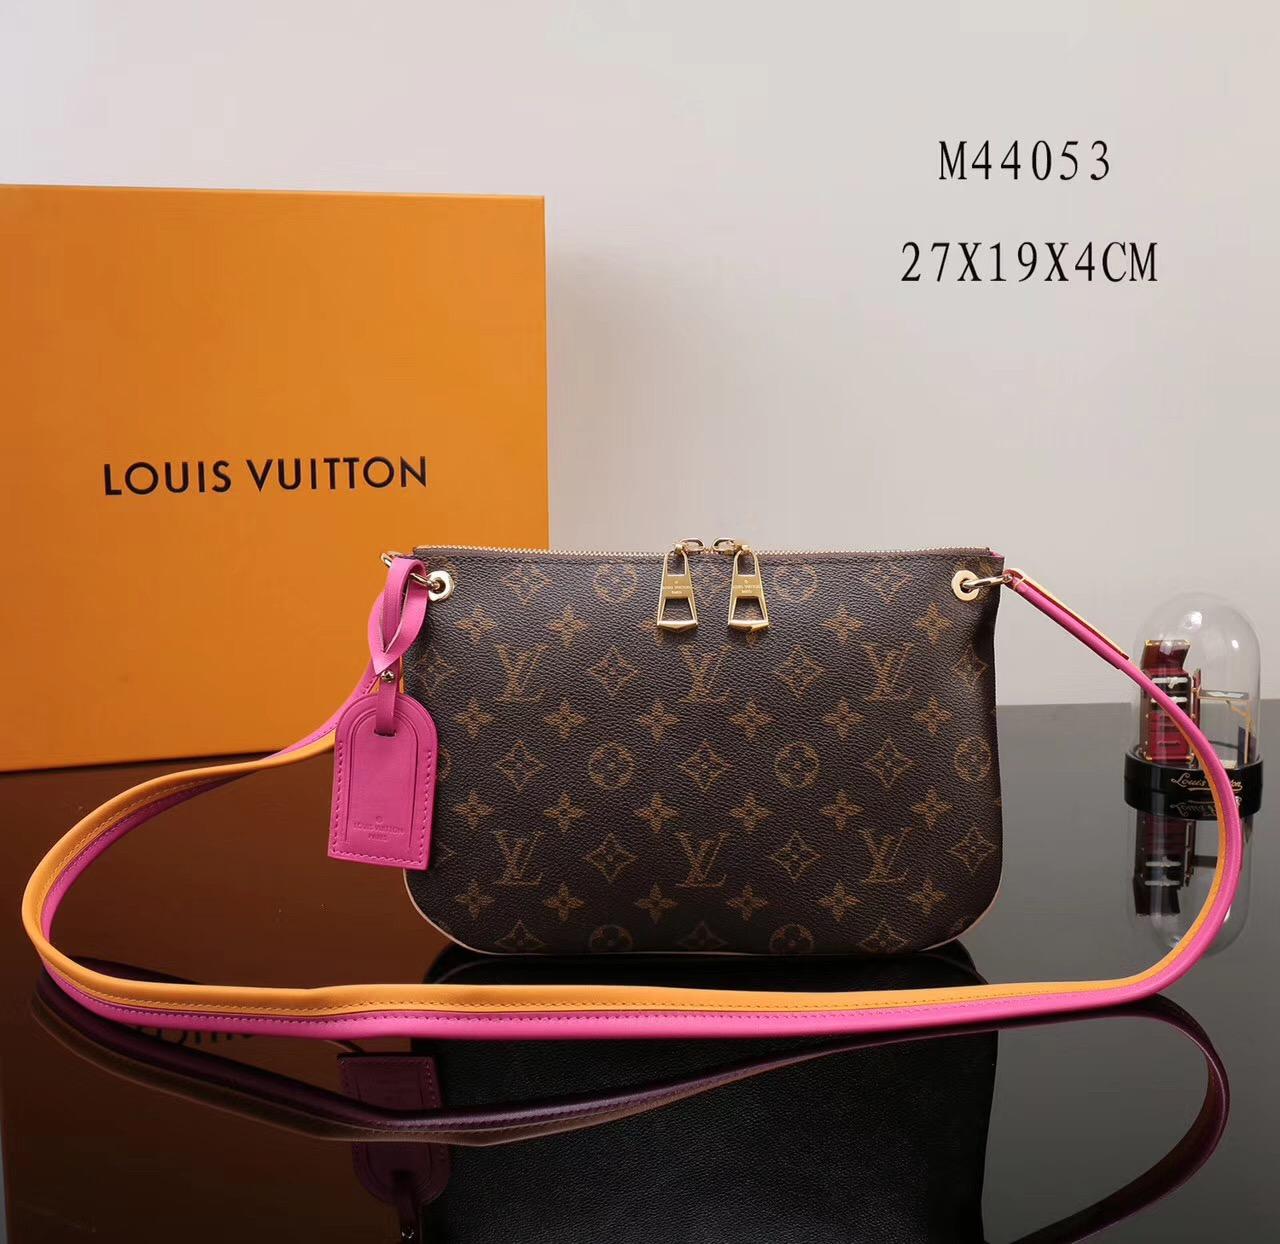 2e30b662bb7c LV Louis Vuitton Monogram M44053 Small bags Shoulder Zipper Handbags Pink  ...